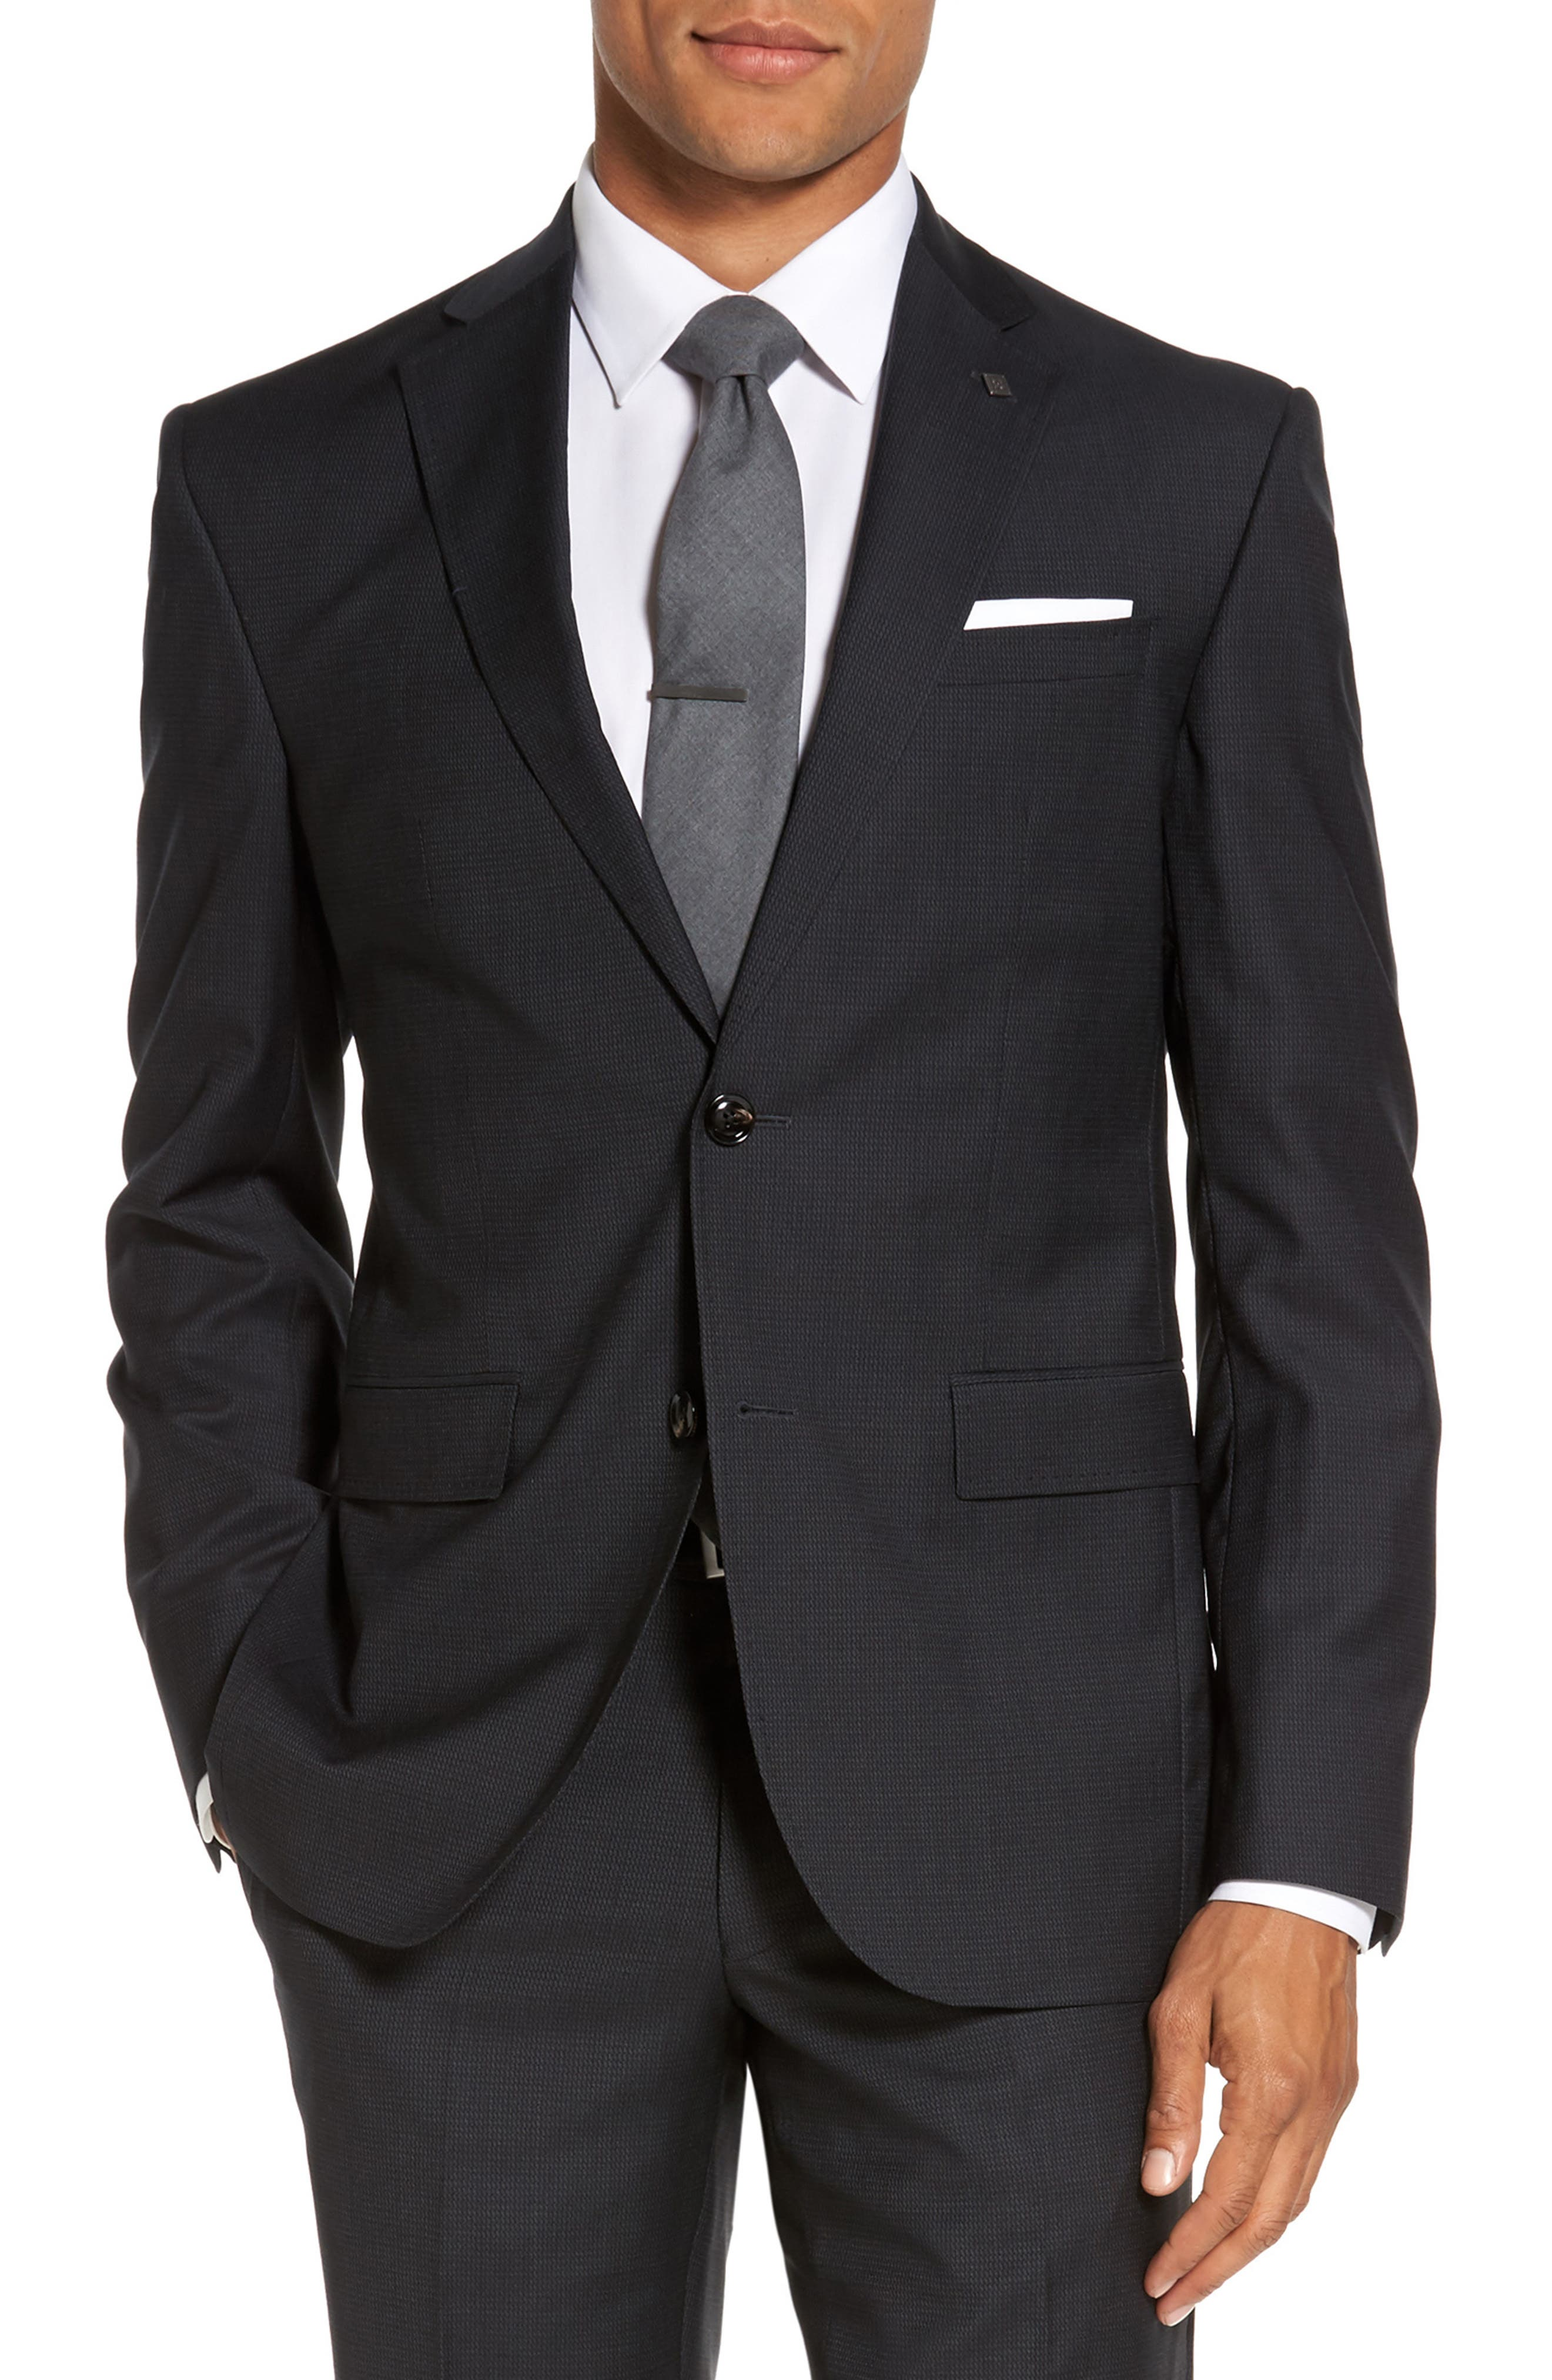 Roger Trim Fit Solid Wool Suit,                             Alternate thumbnail 5, color,                             001